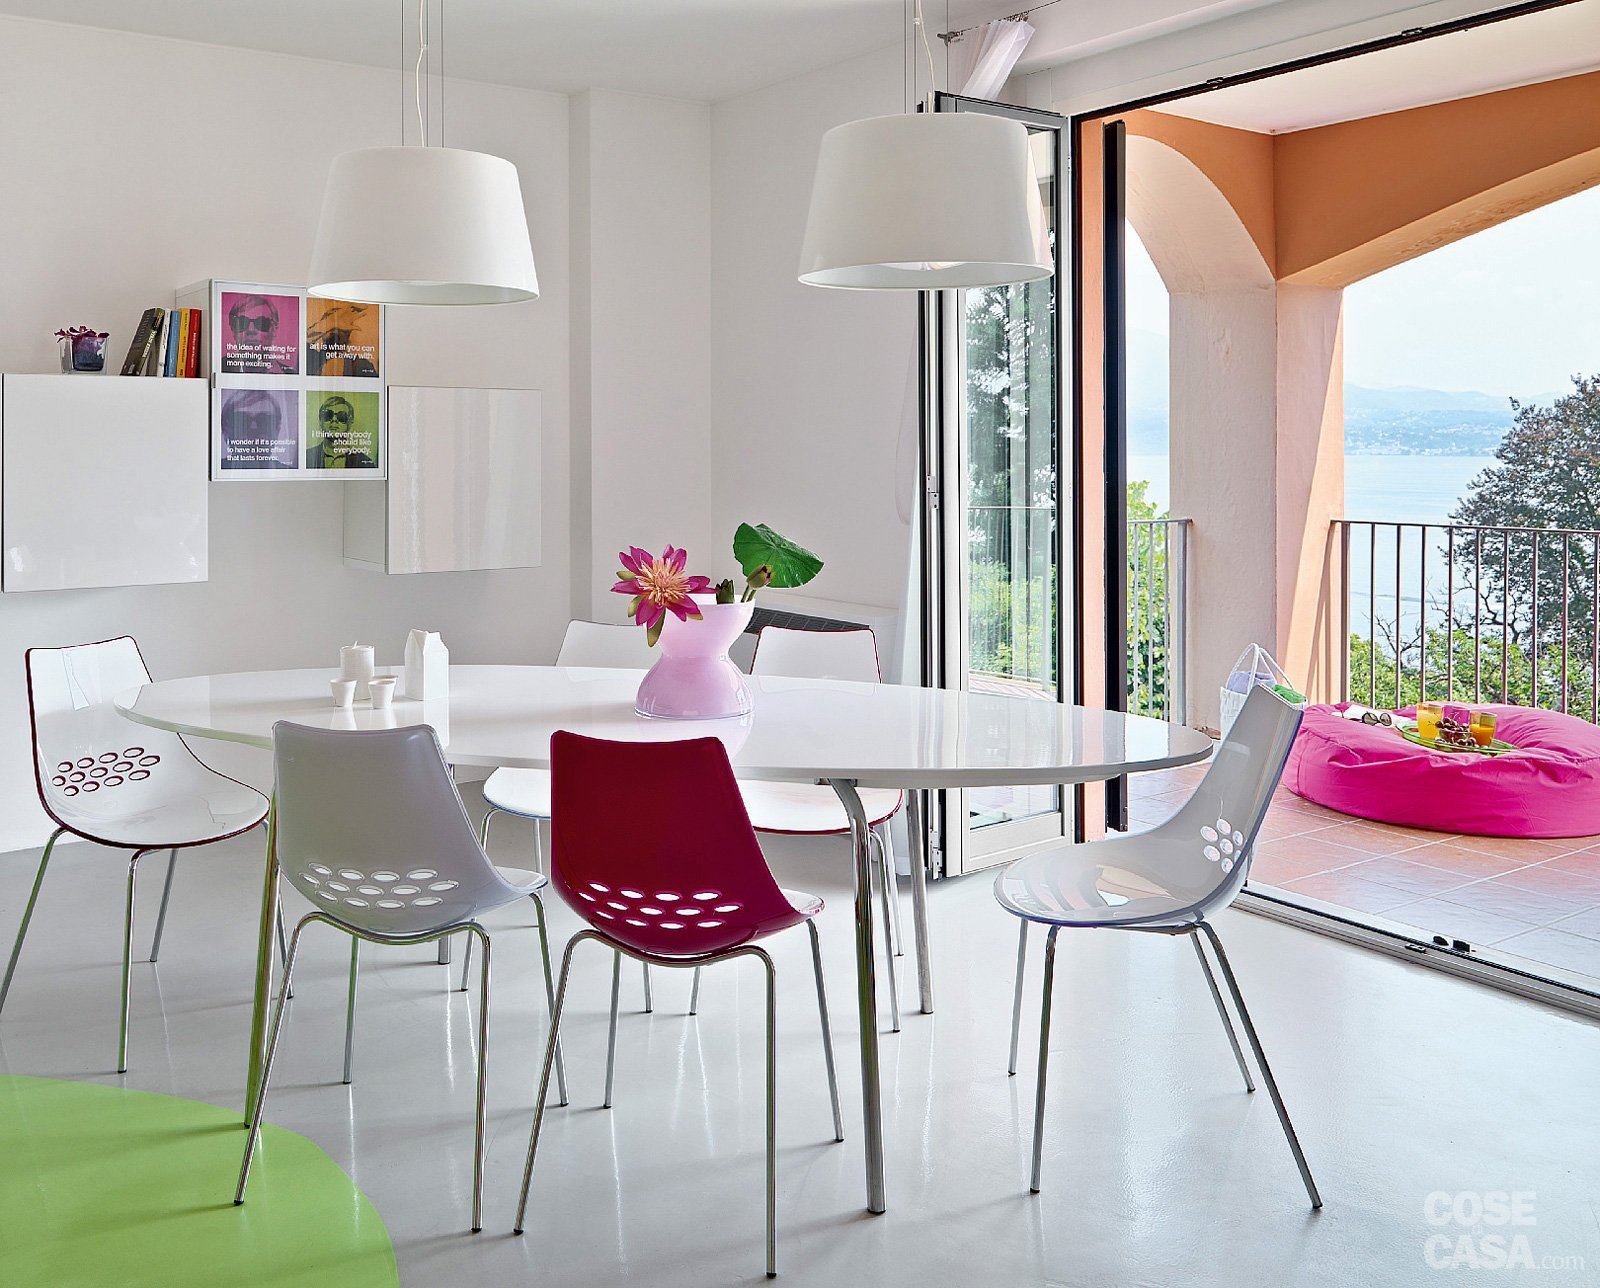 Sedie Cucina Colorate Ikea : Anche La Lavanderia: Il Bagno  #6D1524 1600 1288 Sedie Cucina IKEA